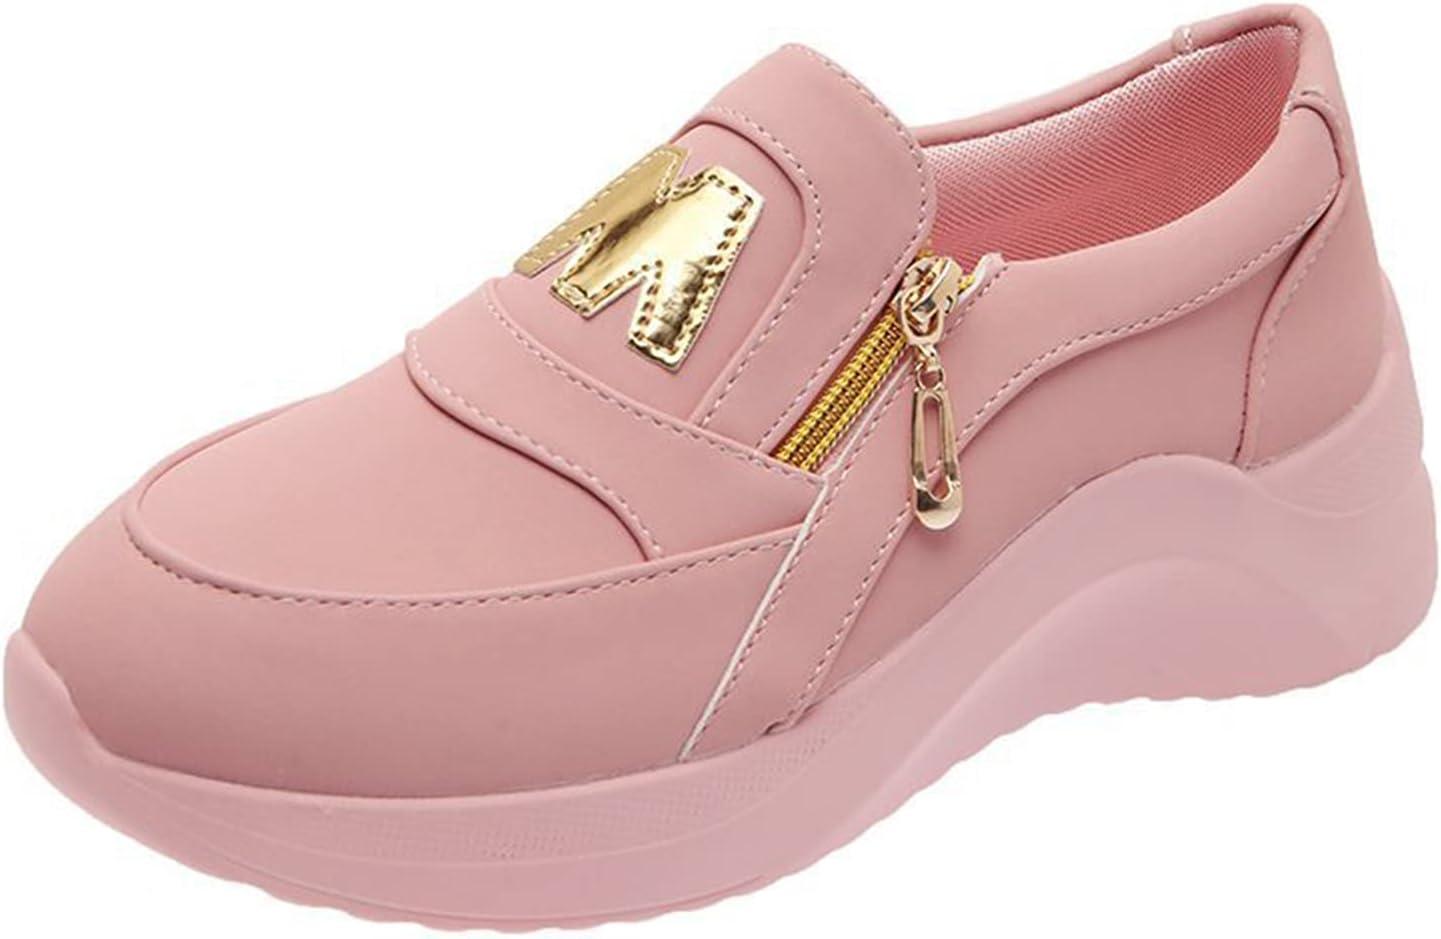 JZENZERO Women Casual Platform Sneakers Breathable Running Walking Sport Tennis Slip On Canvas Shoes